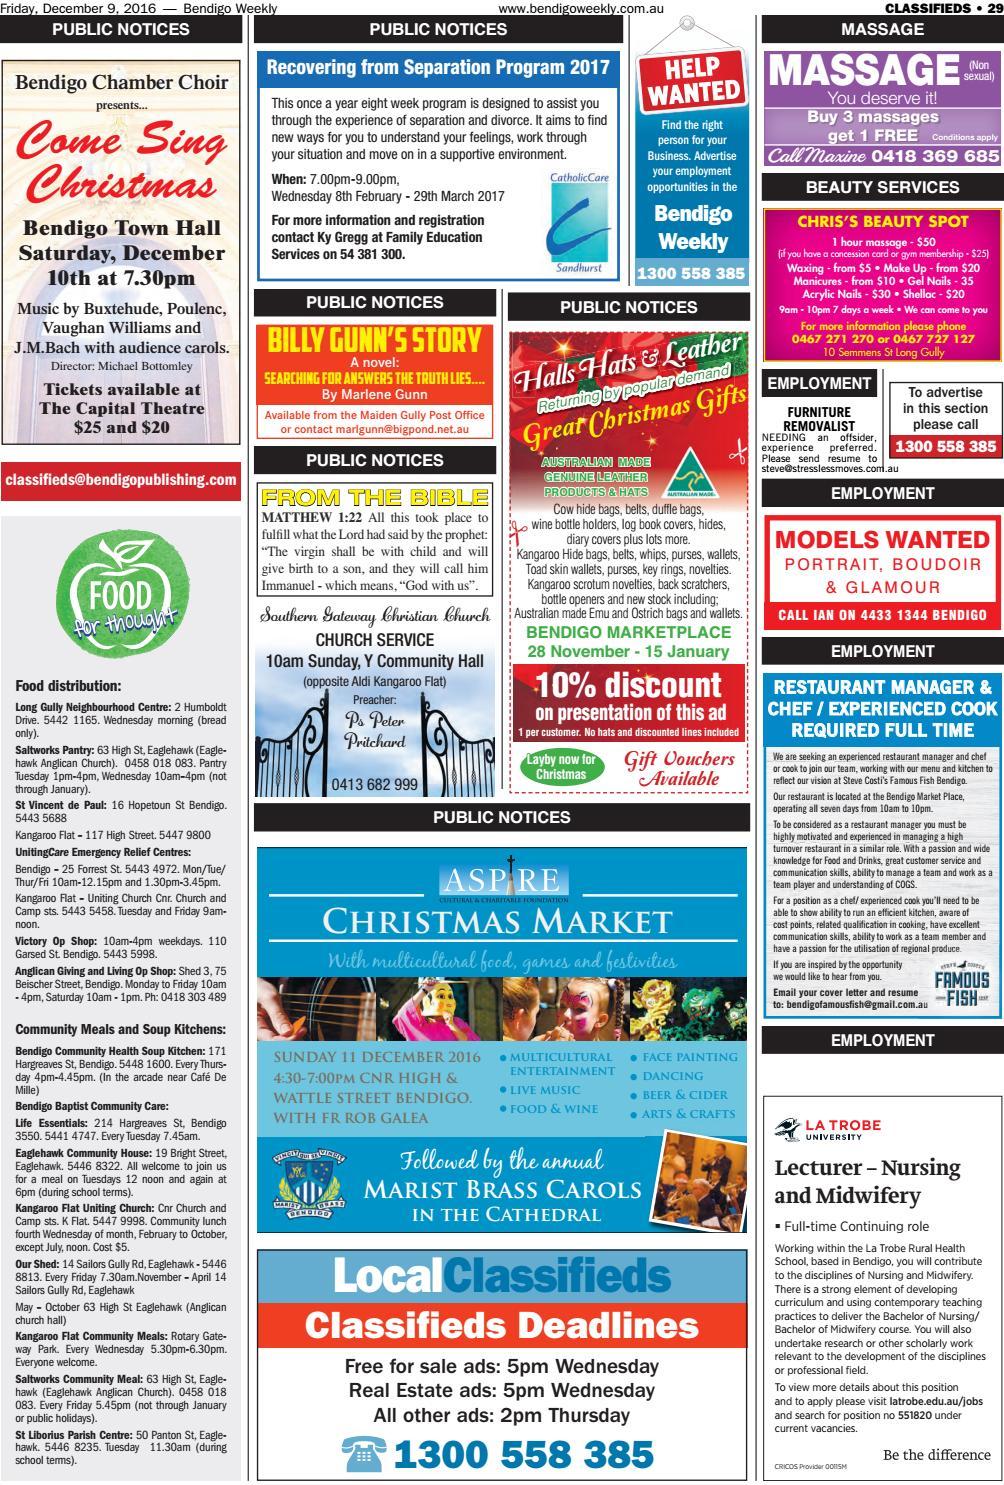 Bendigo Weekly 997 by Bendigo Weekly - issuu